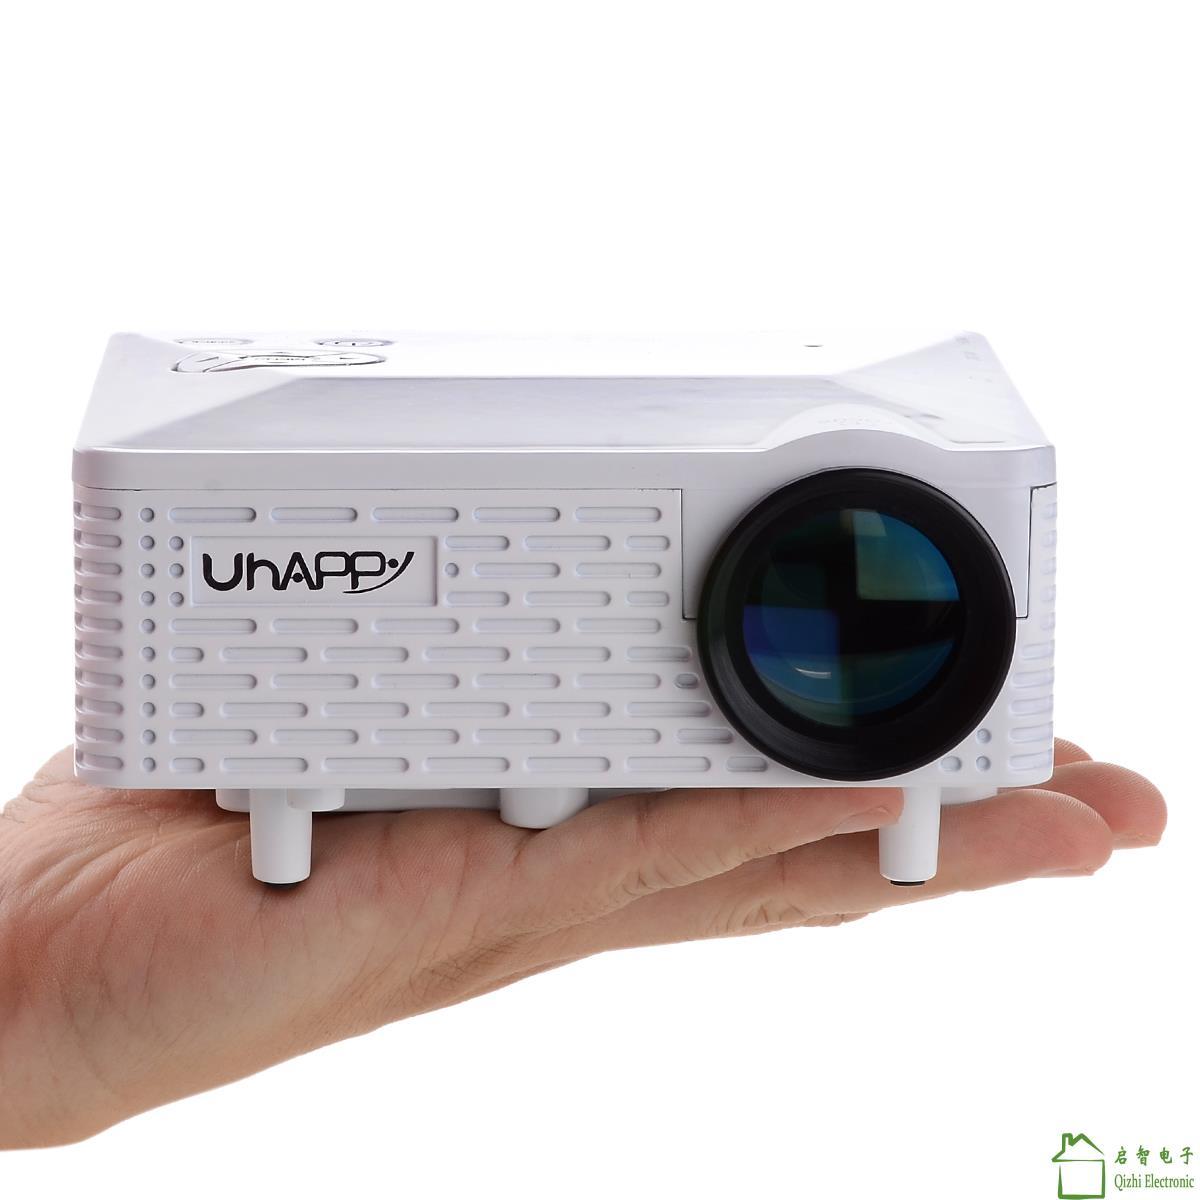 Portable Exhibition Quiz : Hd mini led video projector game xbox tv data show